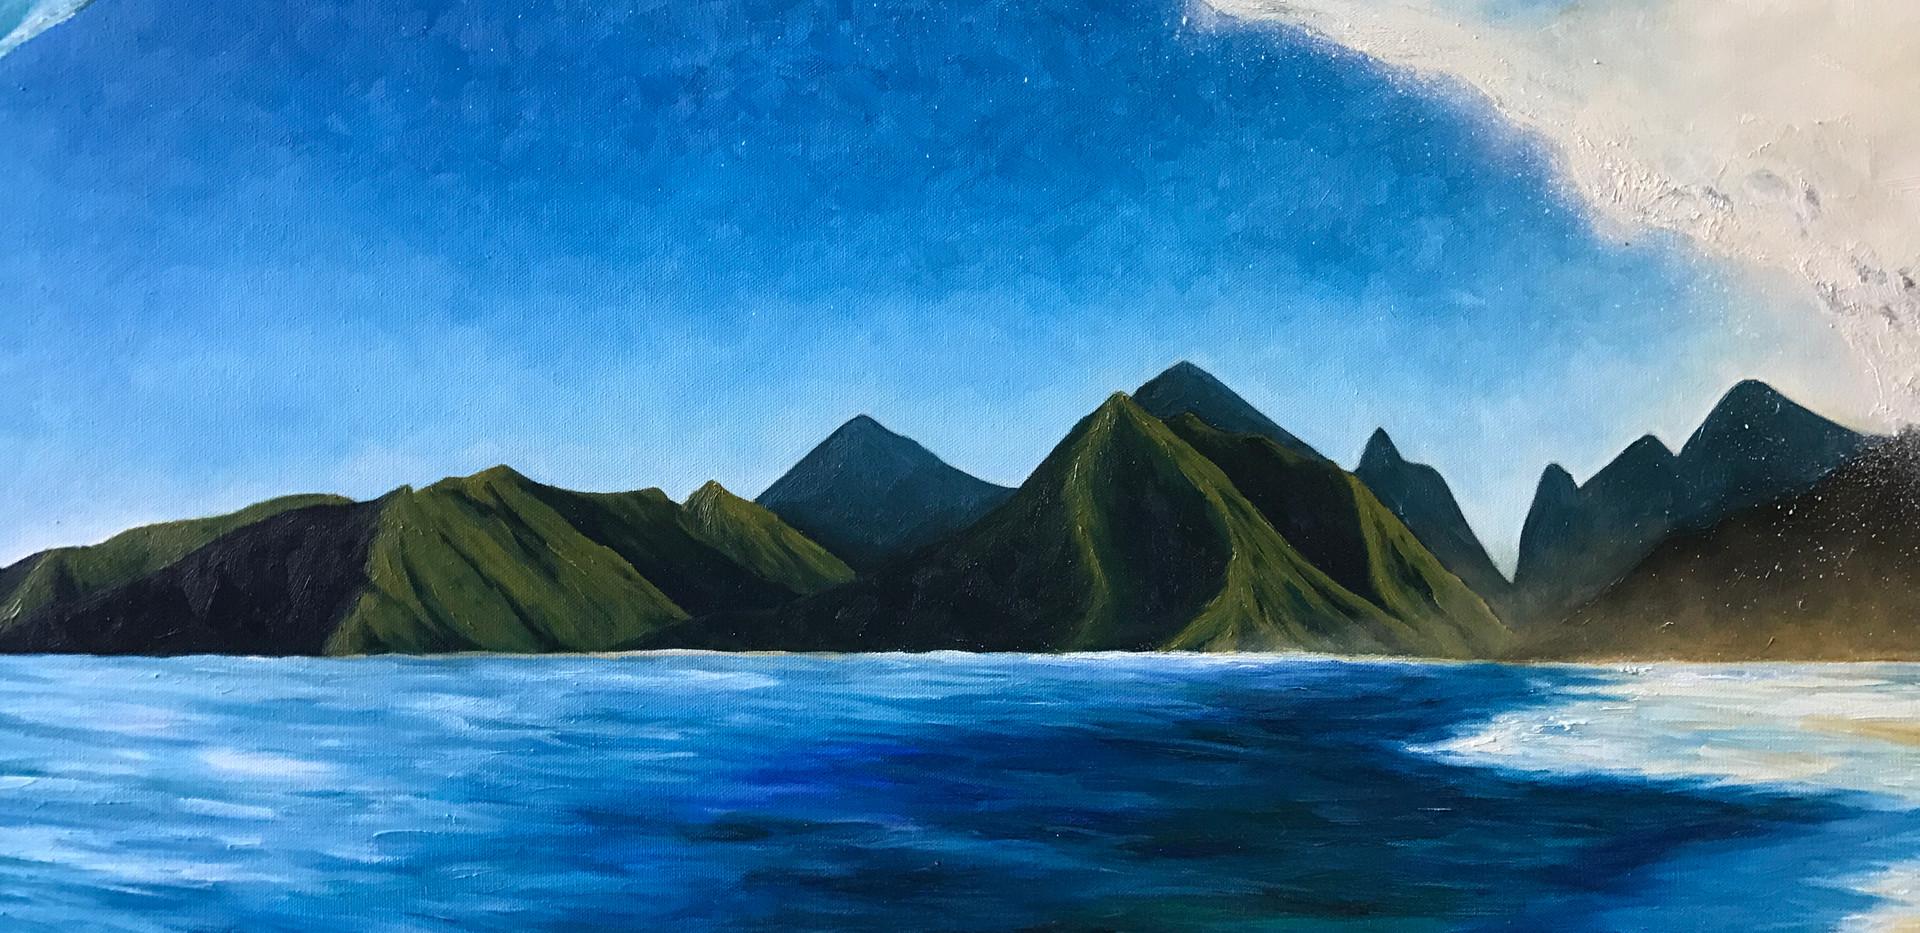 The Big Blue Wave #4